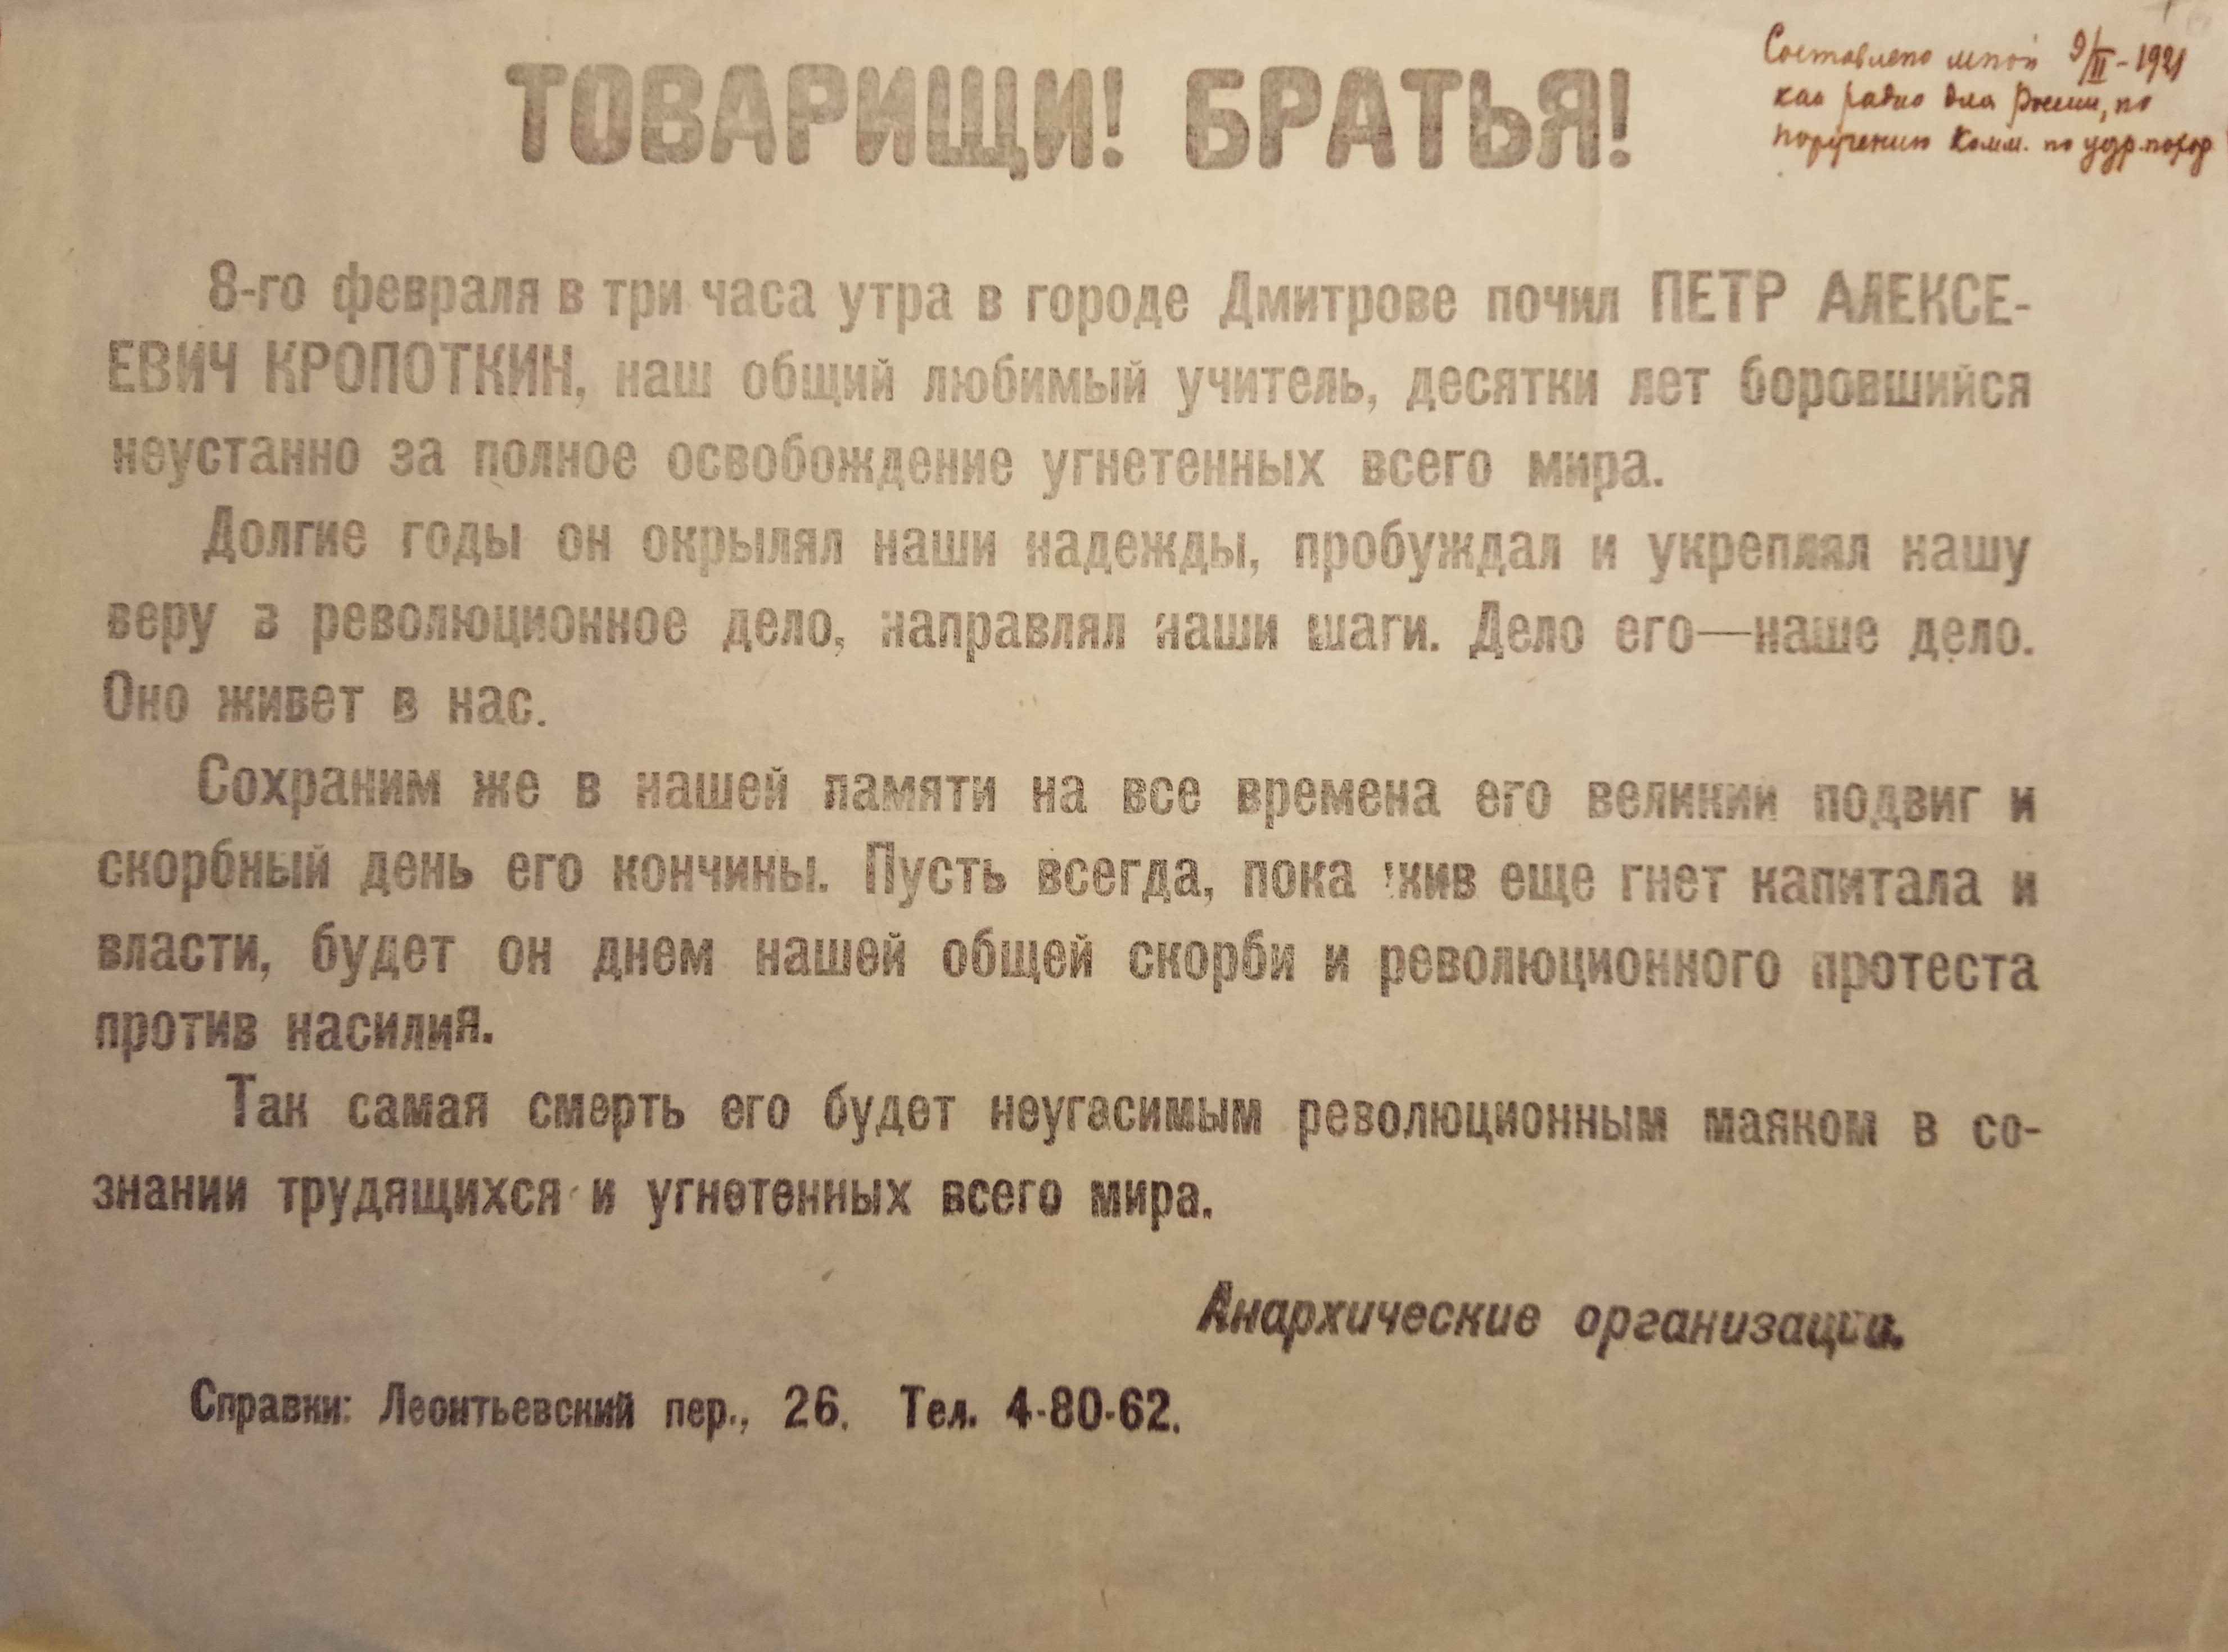 Листовка о кончине П.А.Кропоткина, с автографом А.А.Борового